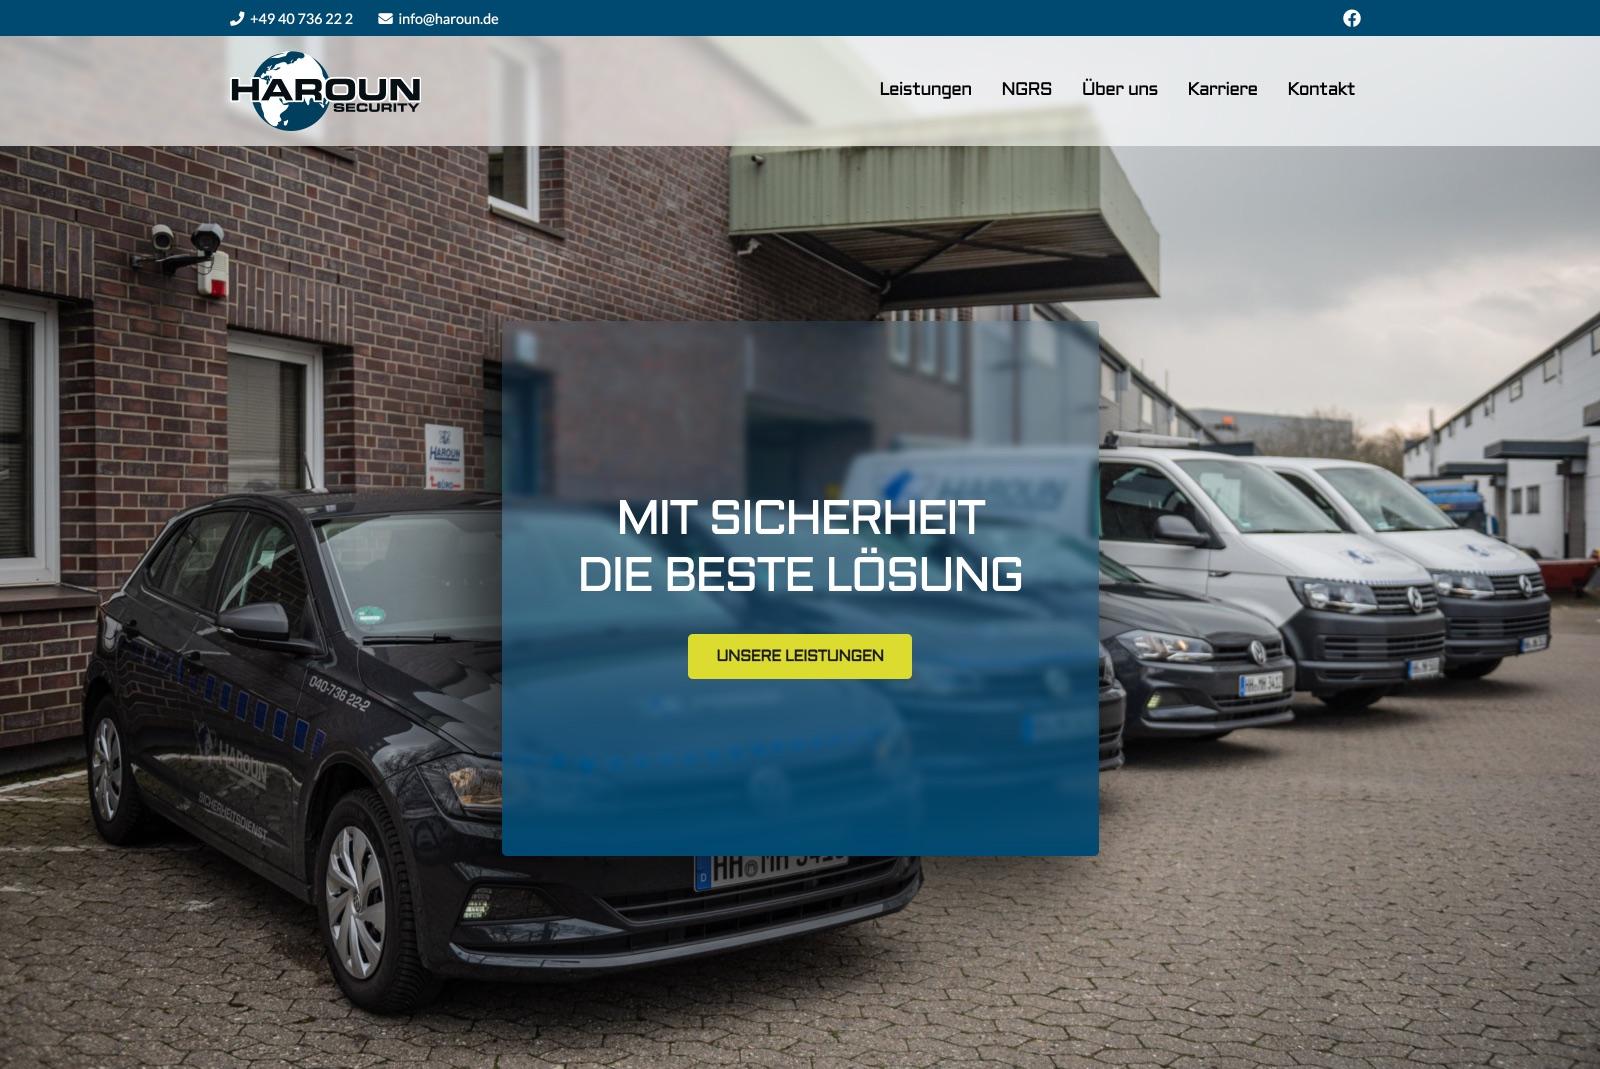 Haroun Security GmbH & Co. KG - Startseite